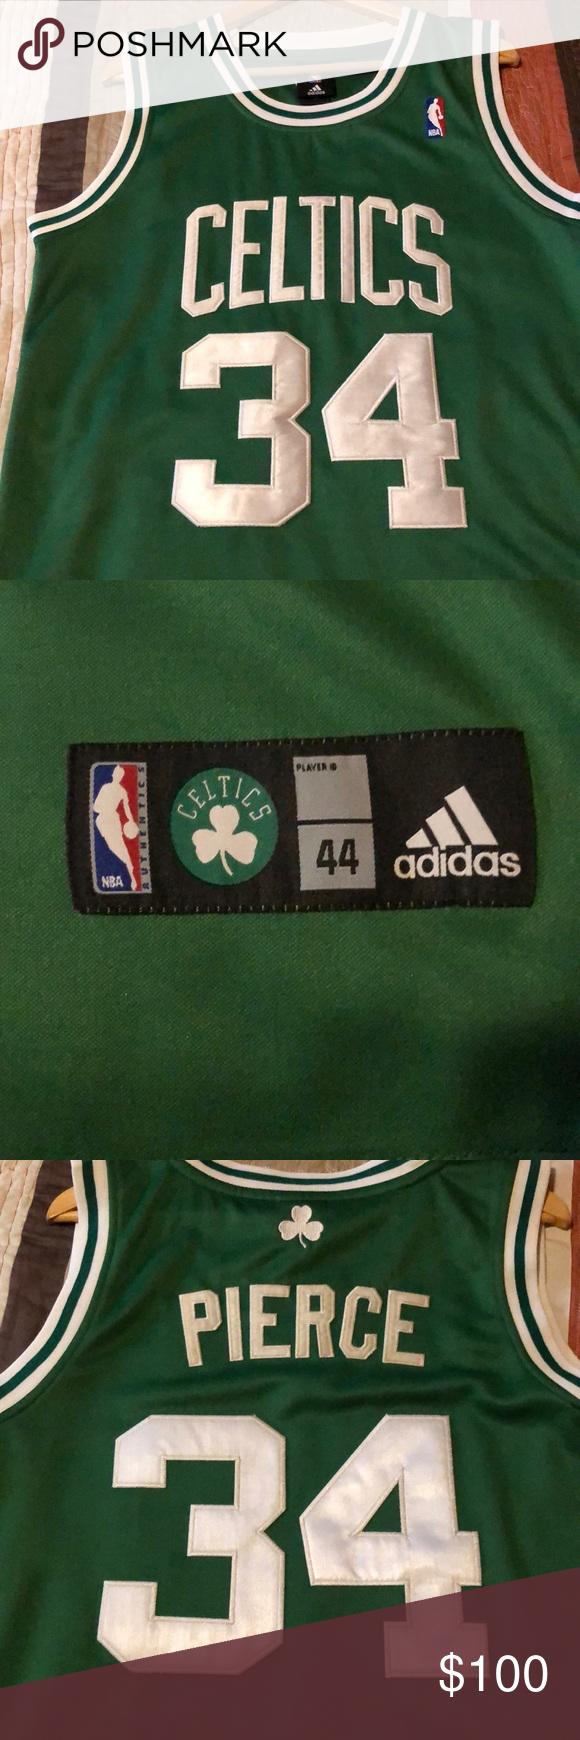 sports shoes de3e6 1ed16 NBA AUTHENTIC JERSEY same as worn on court!!! Boston Celtics ...